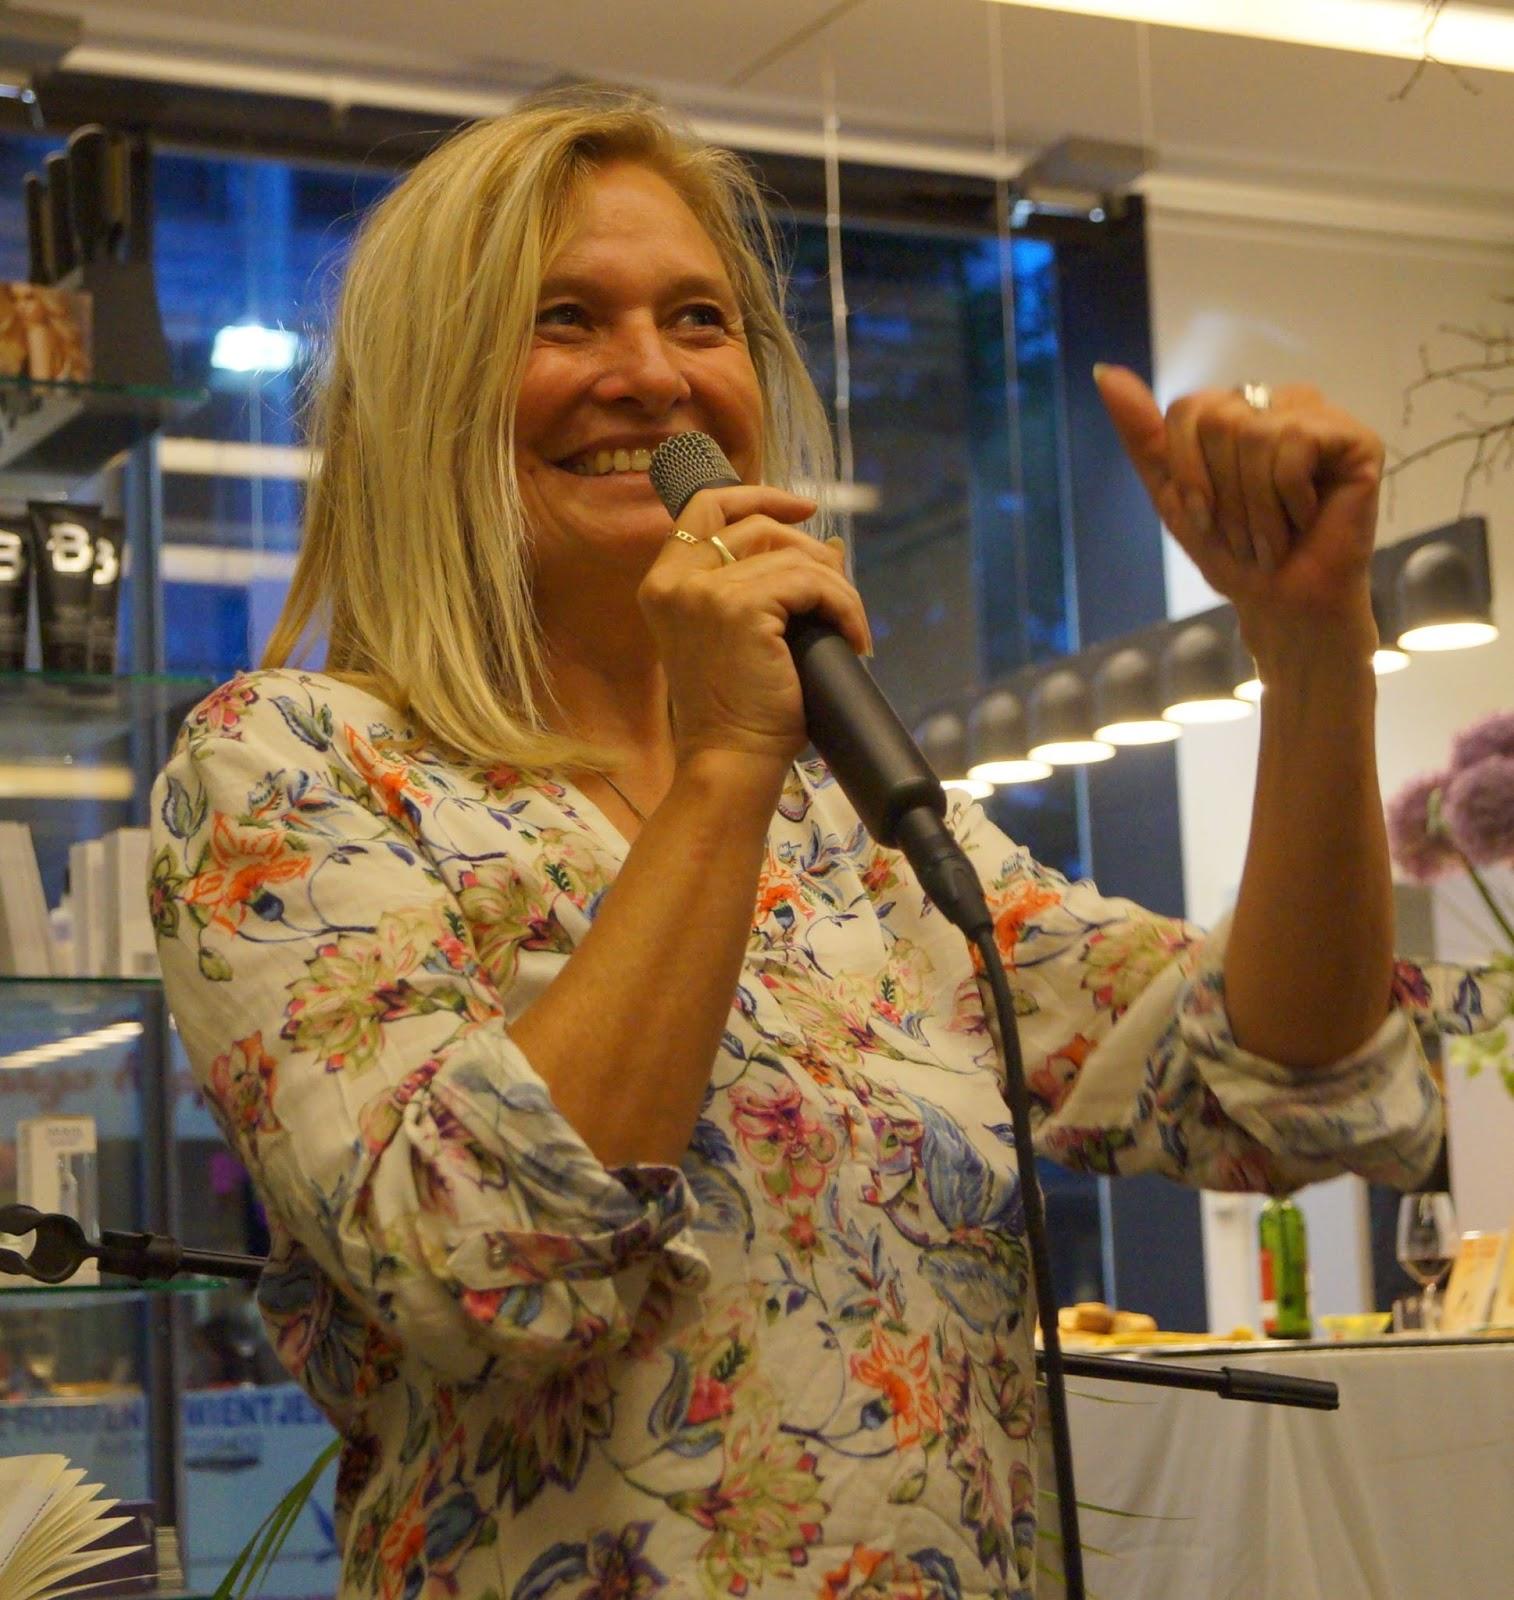 Lesendes Katzenpersonal: [Lesung] Susanne Aernecke stellt \